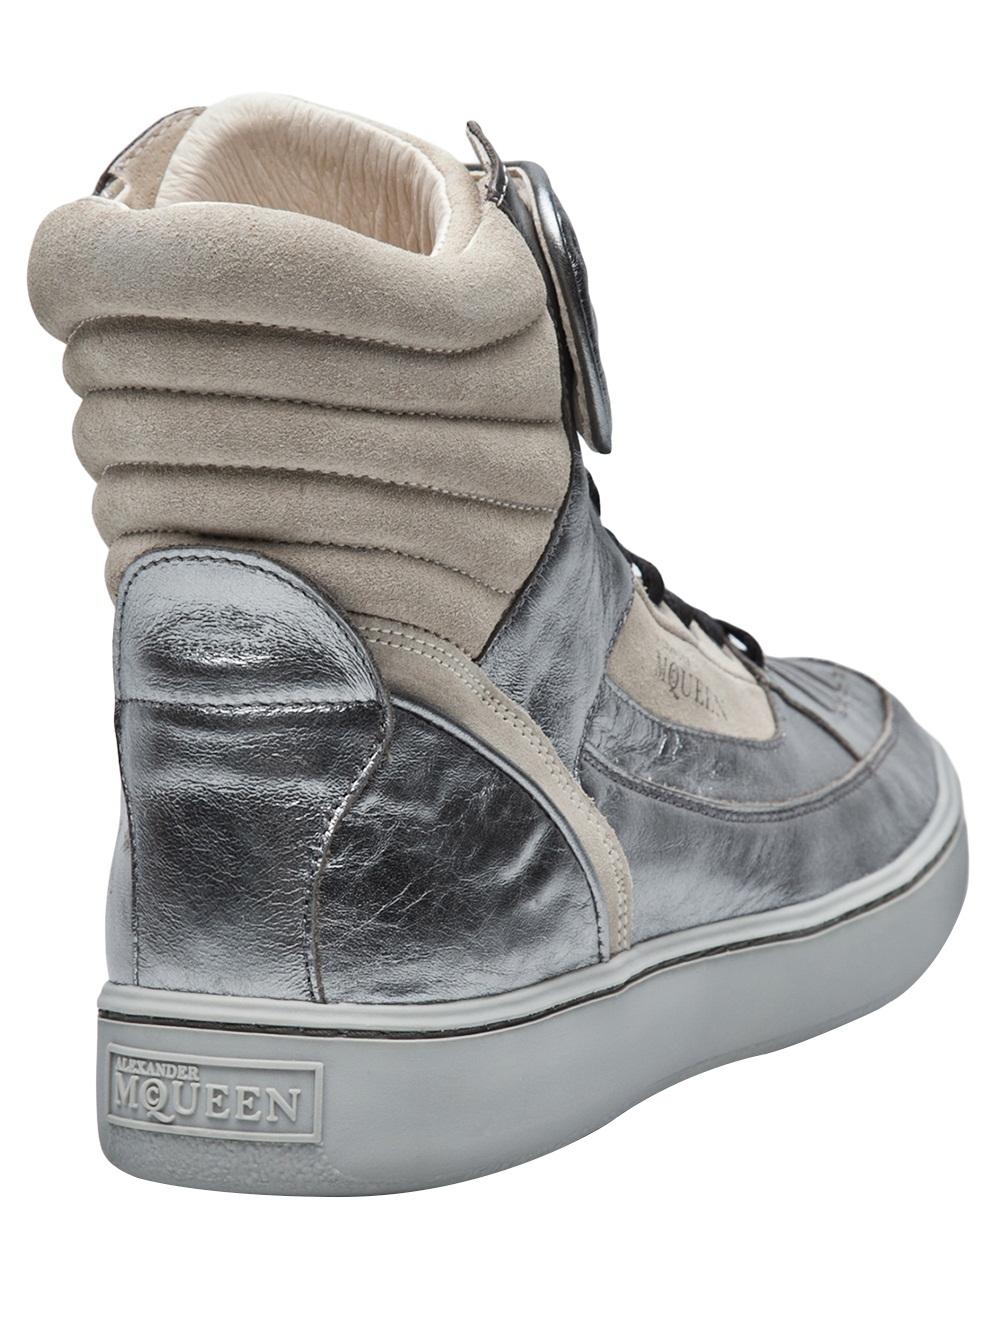 Lyst - Alexander McQueen X Puma Joust Boot in Metallic for Men d2b63ab84